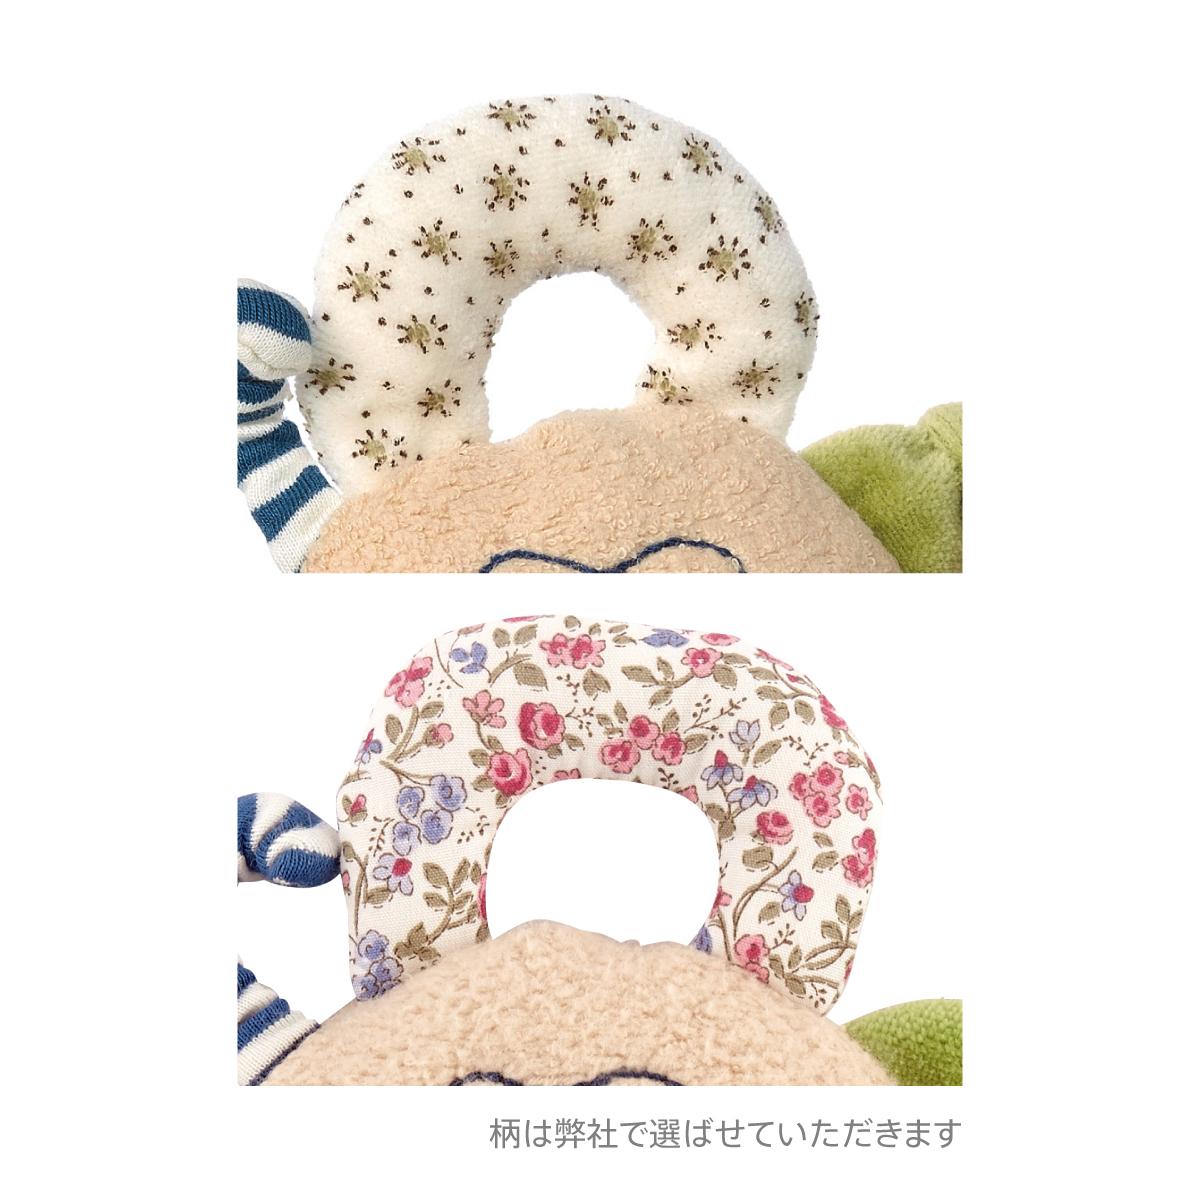 【50%OFF】ピュア・オーガニック お花の手あそびラトル